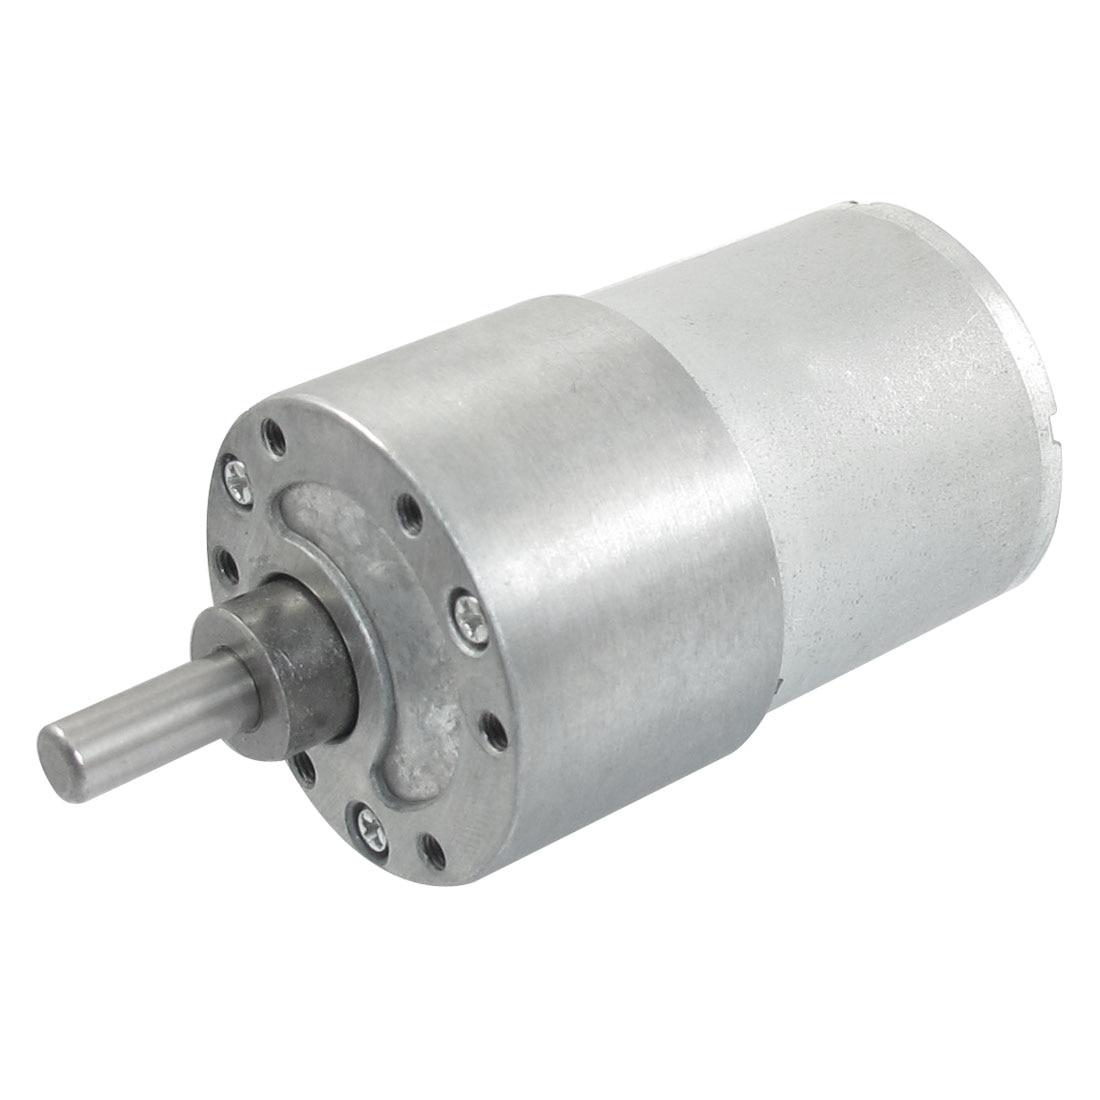 UXCELL 80 Rpm  12V High Torque Gear Box Electric Speed Reduce Motor<br><br>Aliexpress